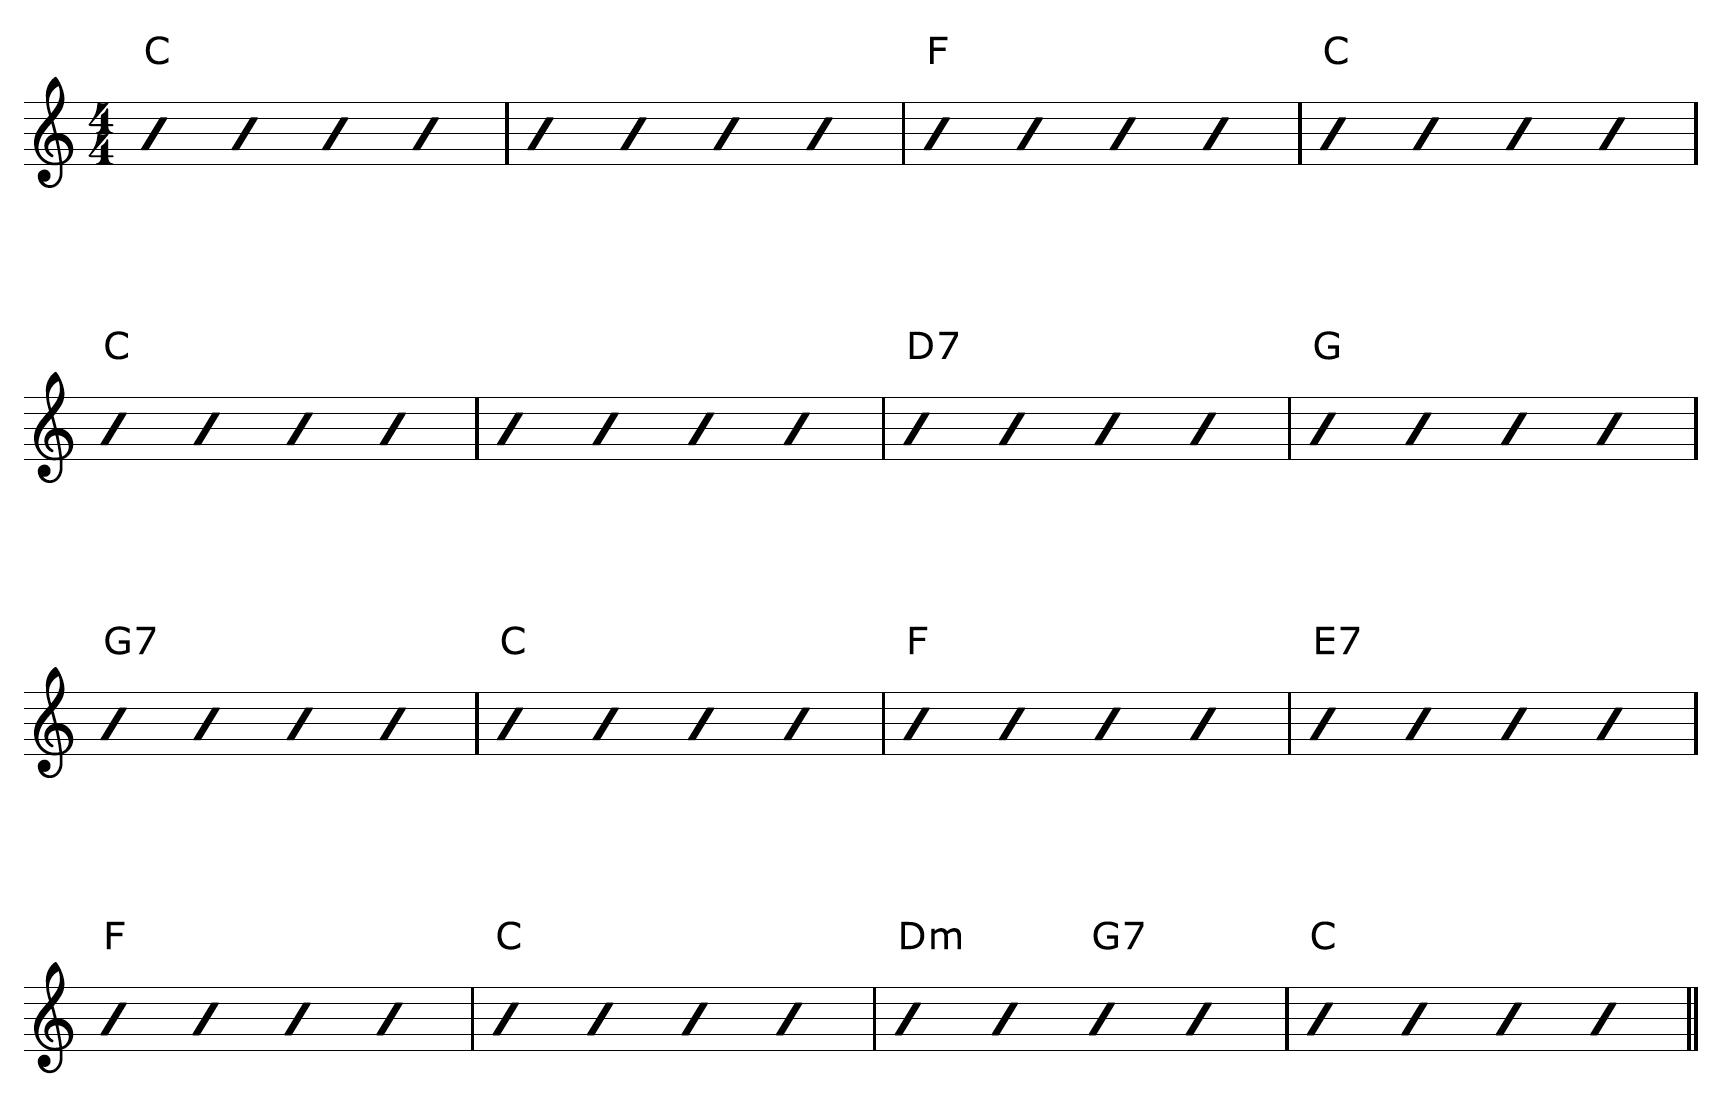 Fingerpicking Guitar Arrangement Chords